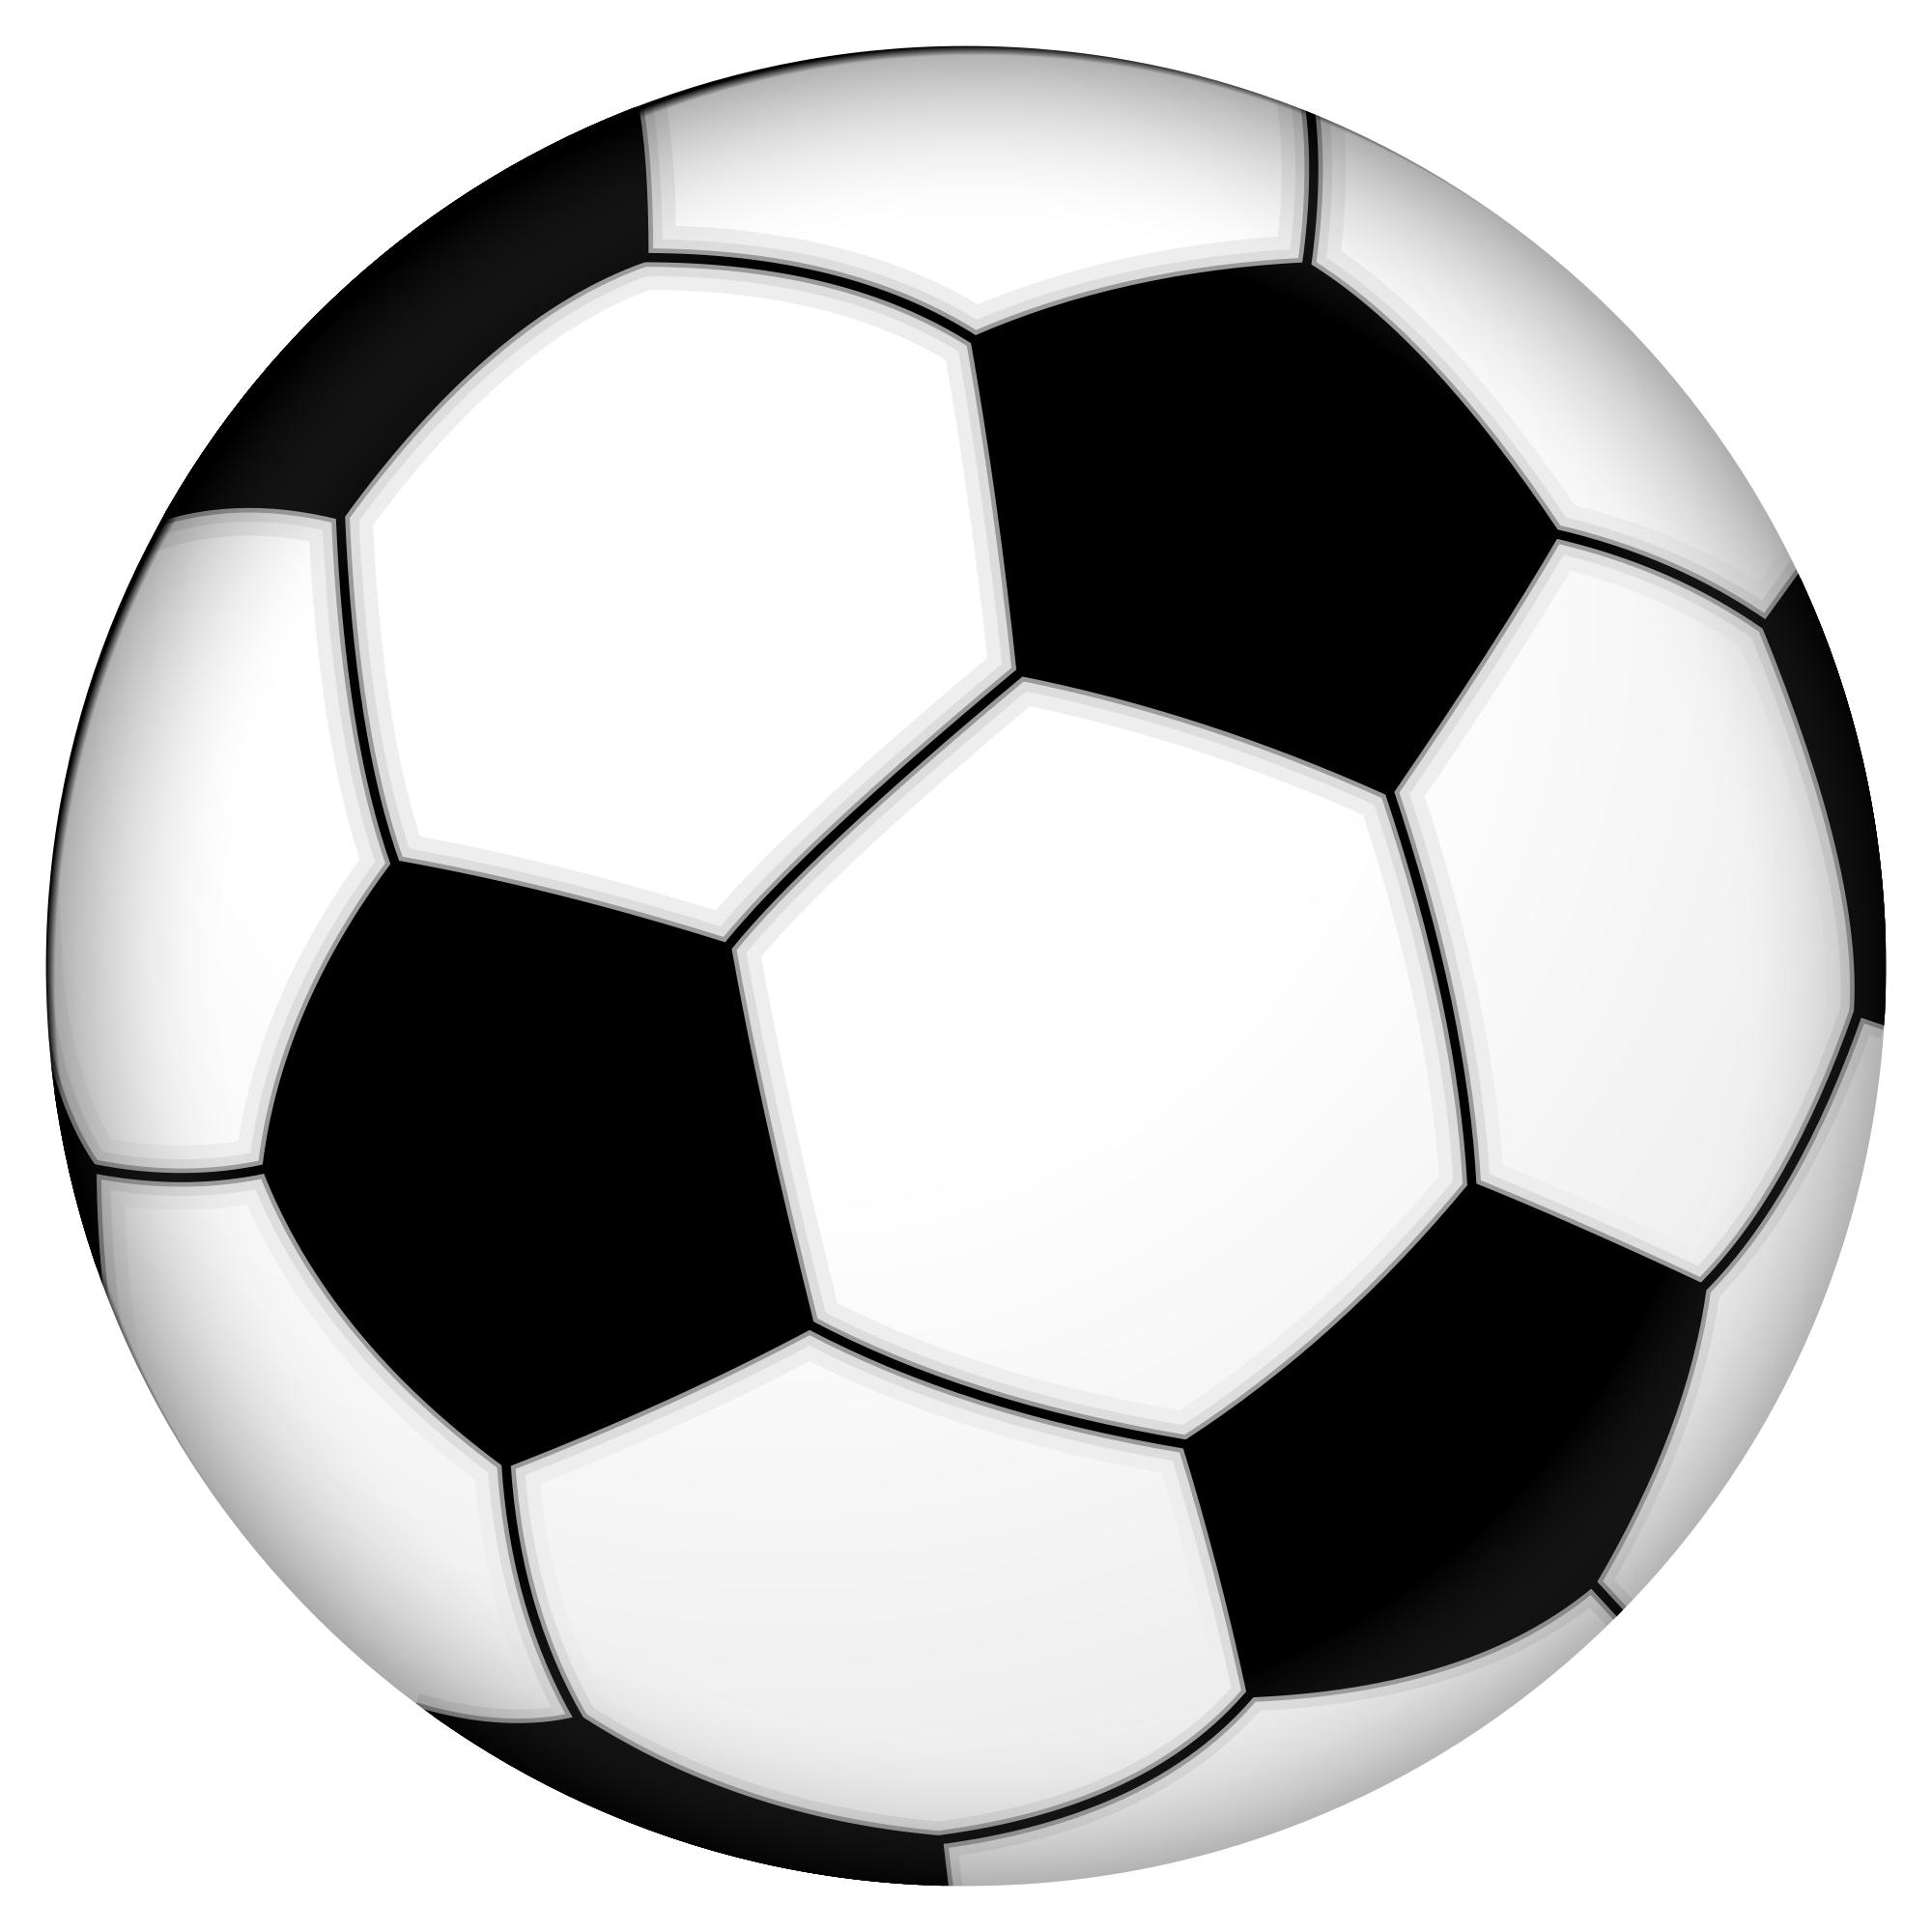 2000x2000 Soccer Ball Clip Art Black And White Free